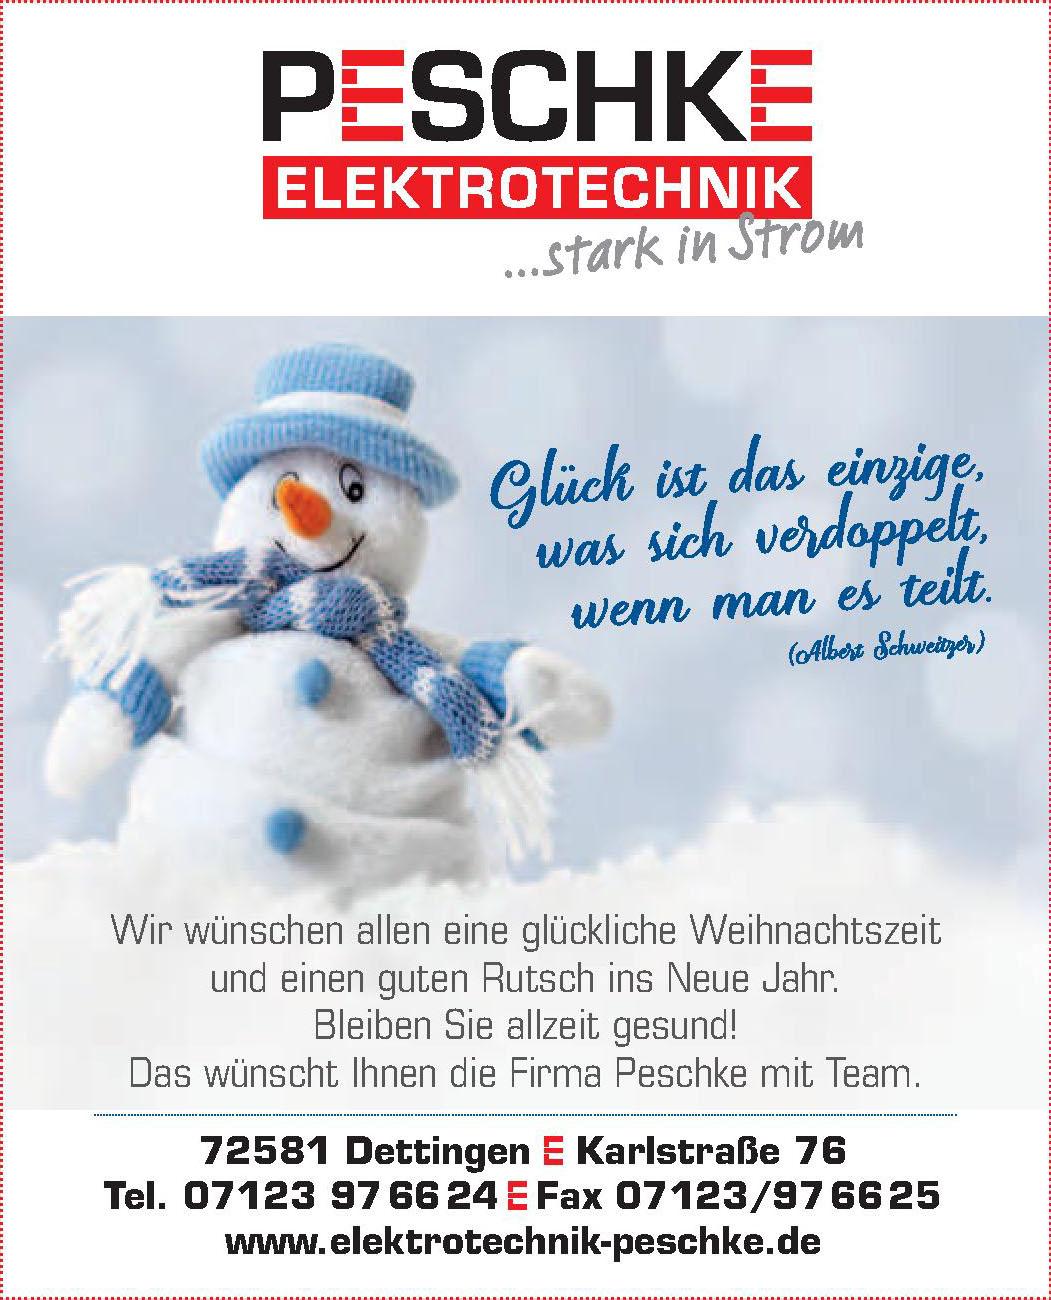 Peschke Elektrotechnik